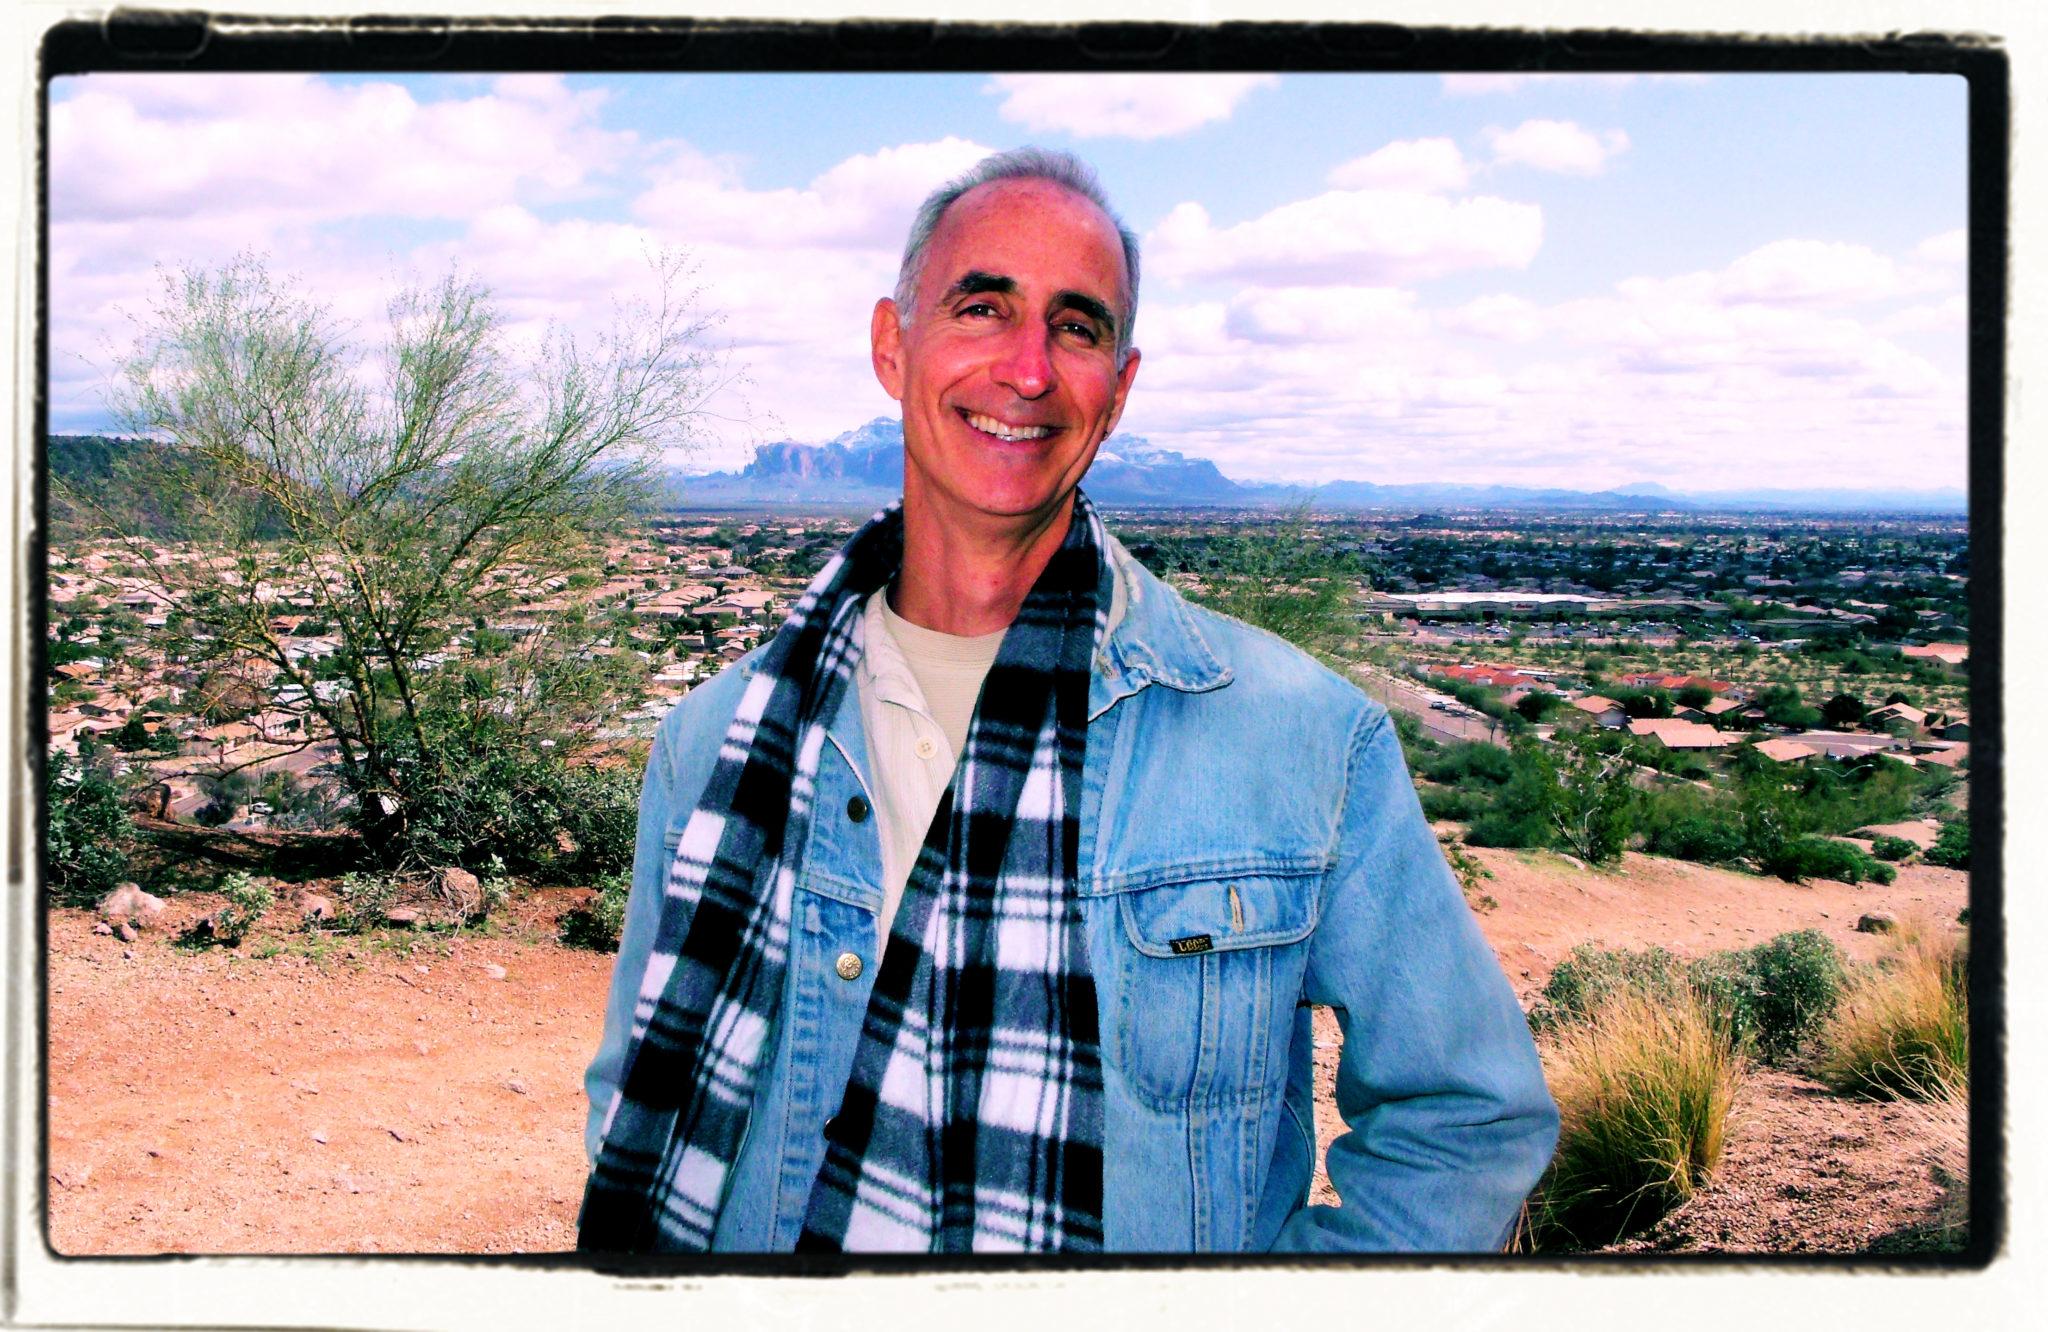 An Interview With Loren Lockman by Steven Ferrel